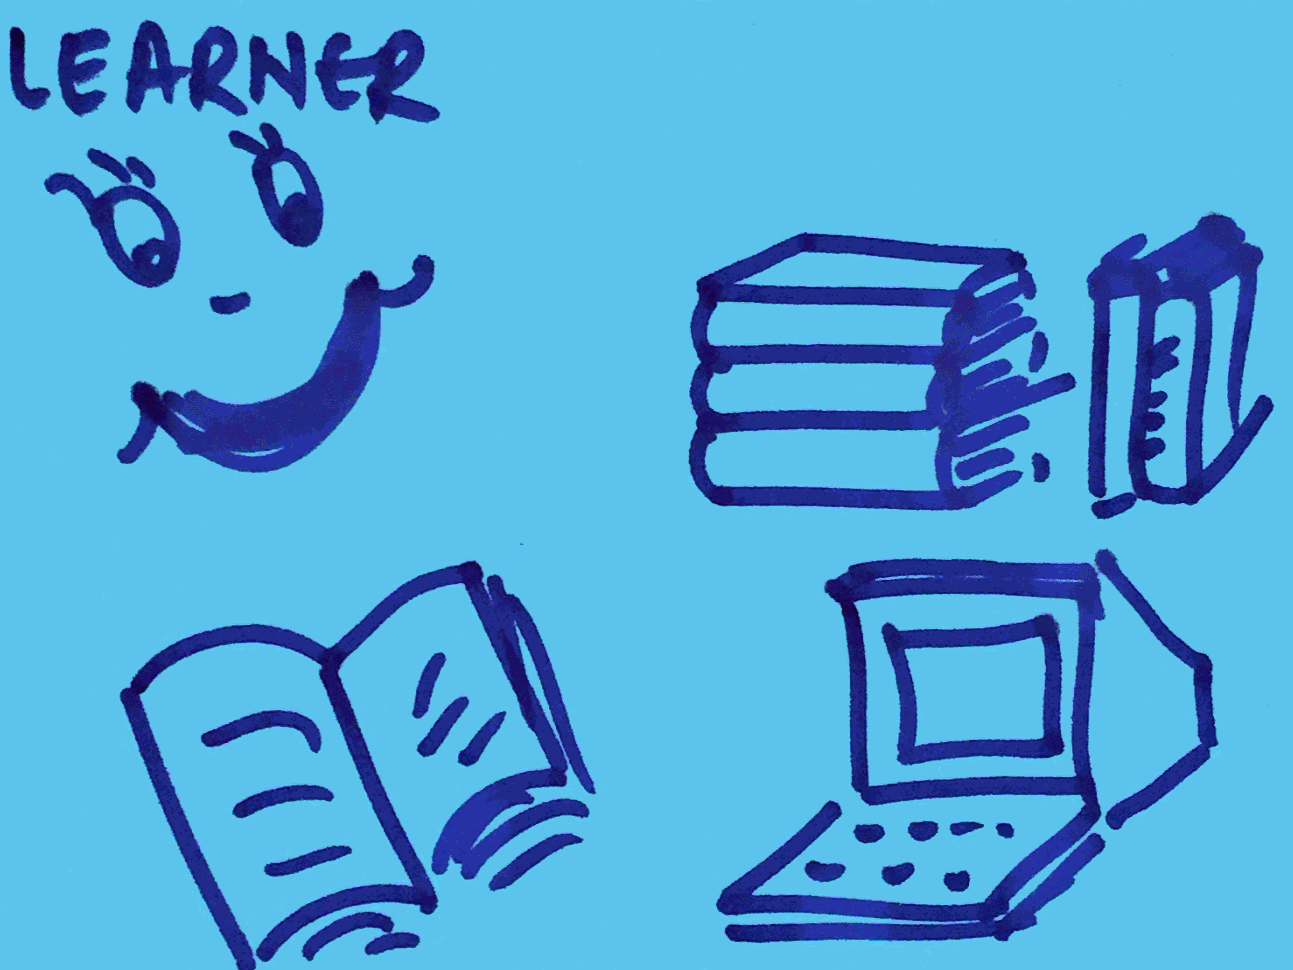 Learner StrengthsFinder Singapore Information Books Computer